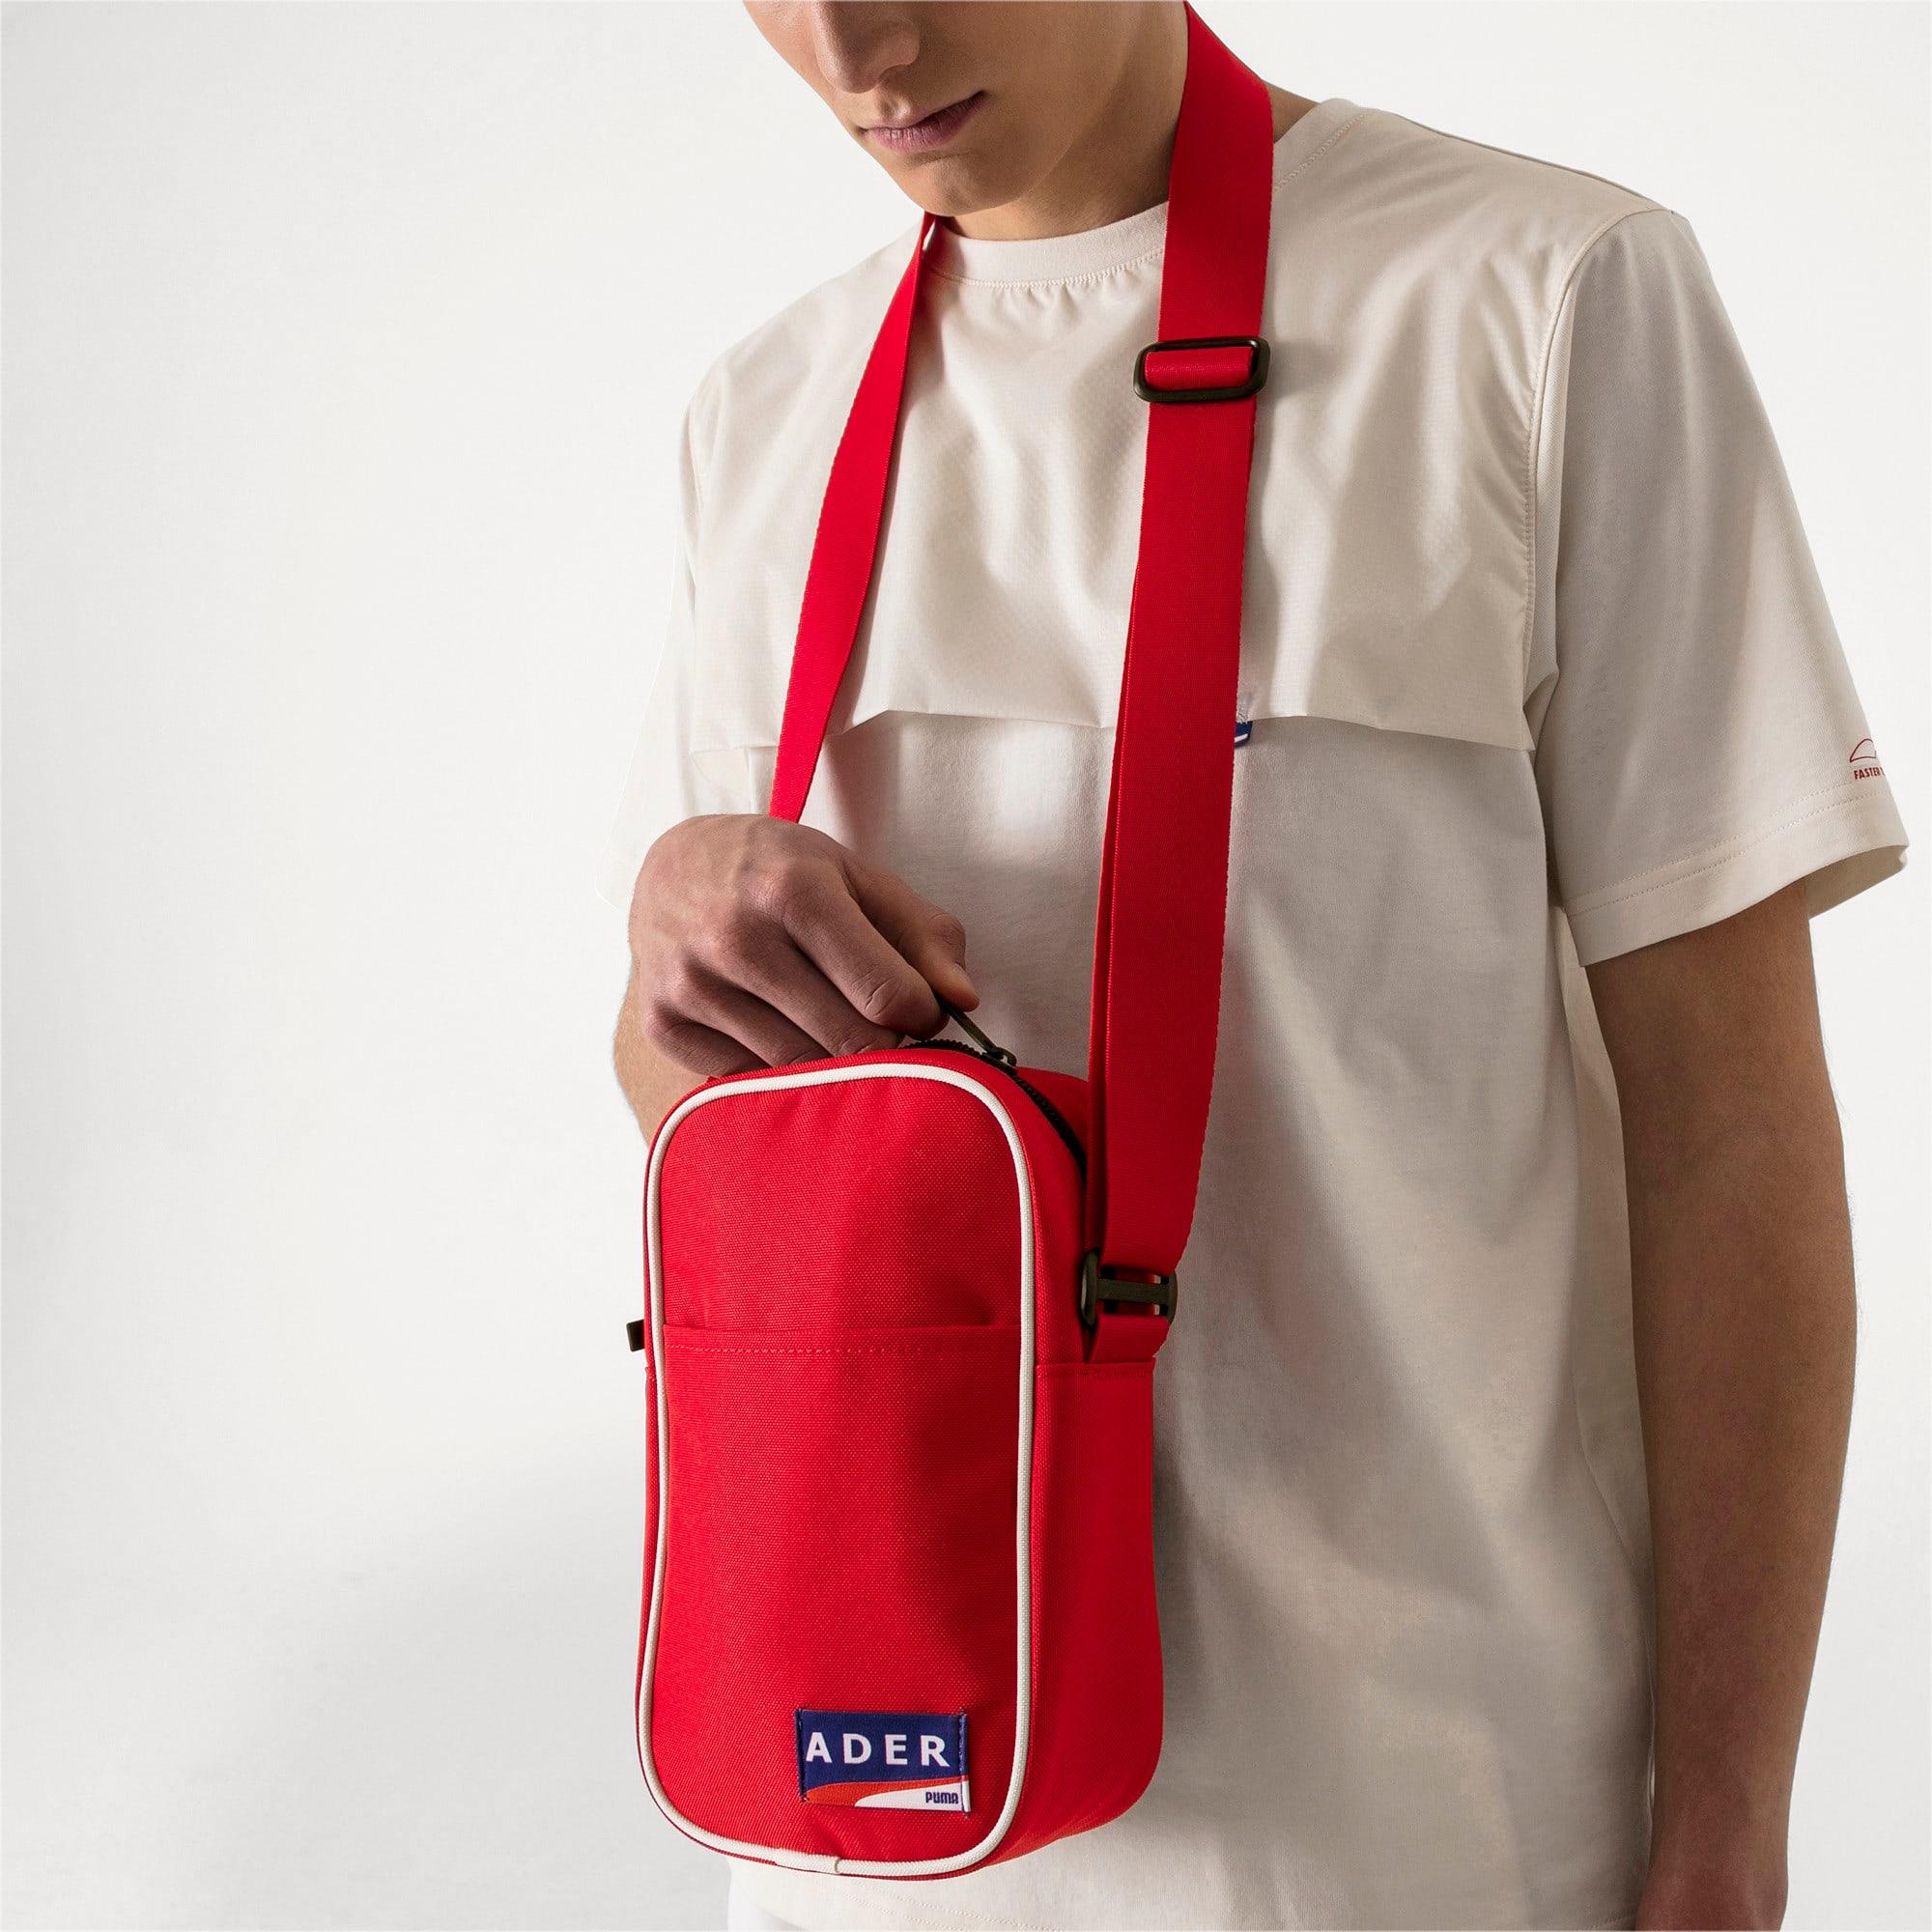 Thumbnail 4 of PUMA x ADER ERROR Portable Bag, Puma Red, medium